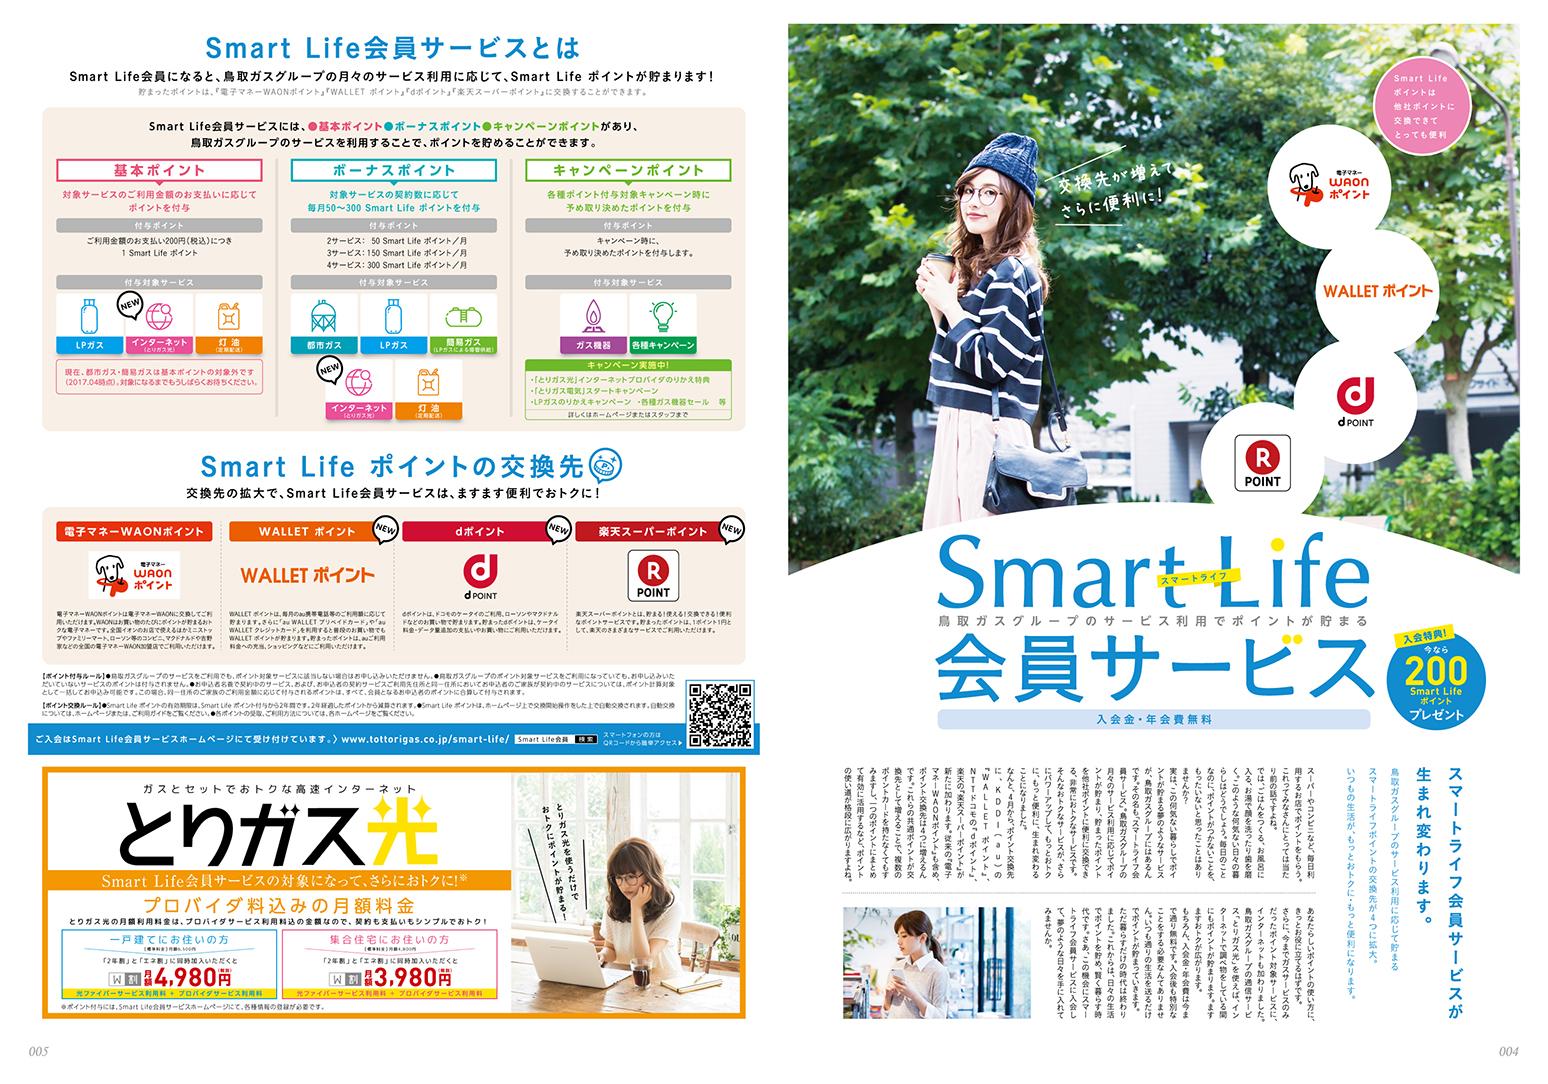 Smart Life会員サービス